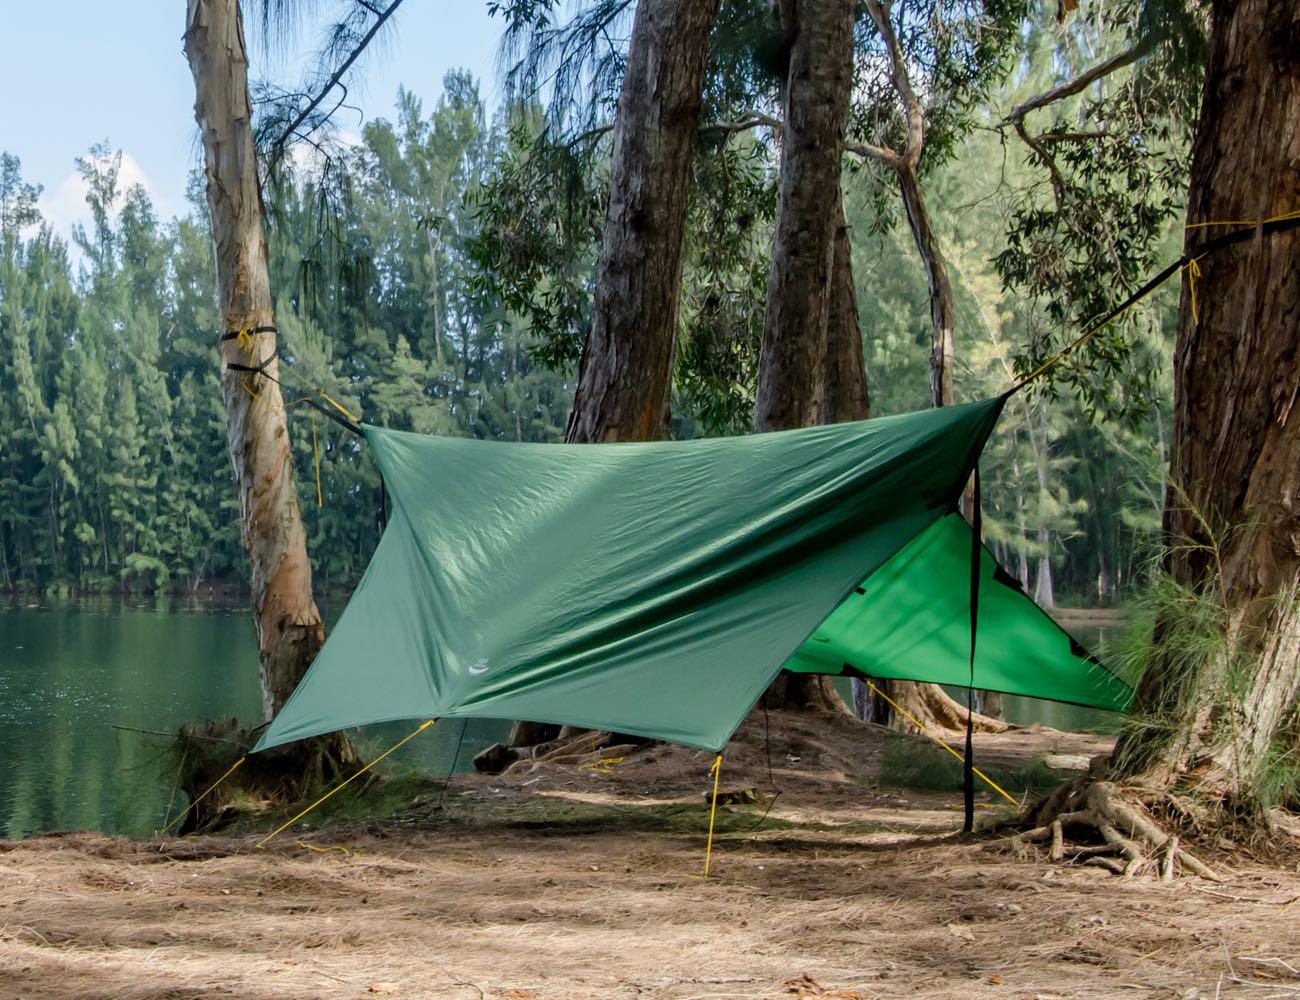 Apex Camping Shelter & Hammock Camping Tarp for Everyone